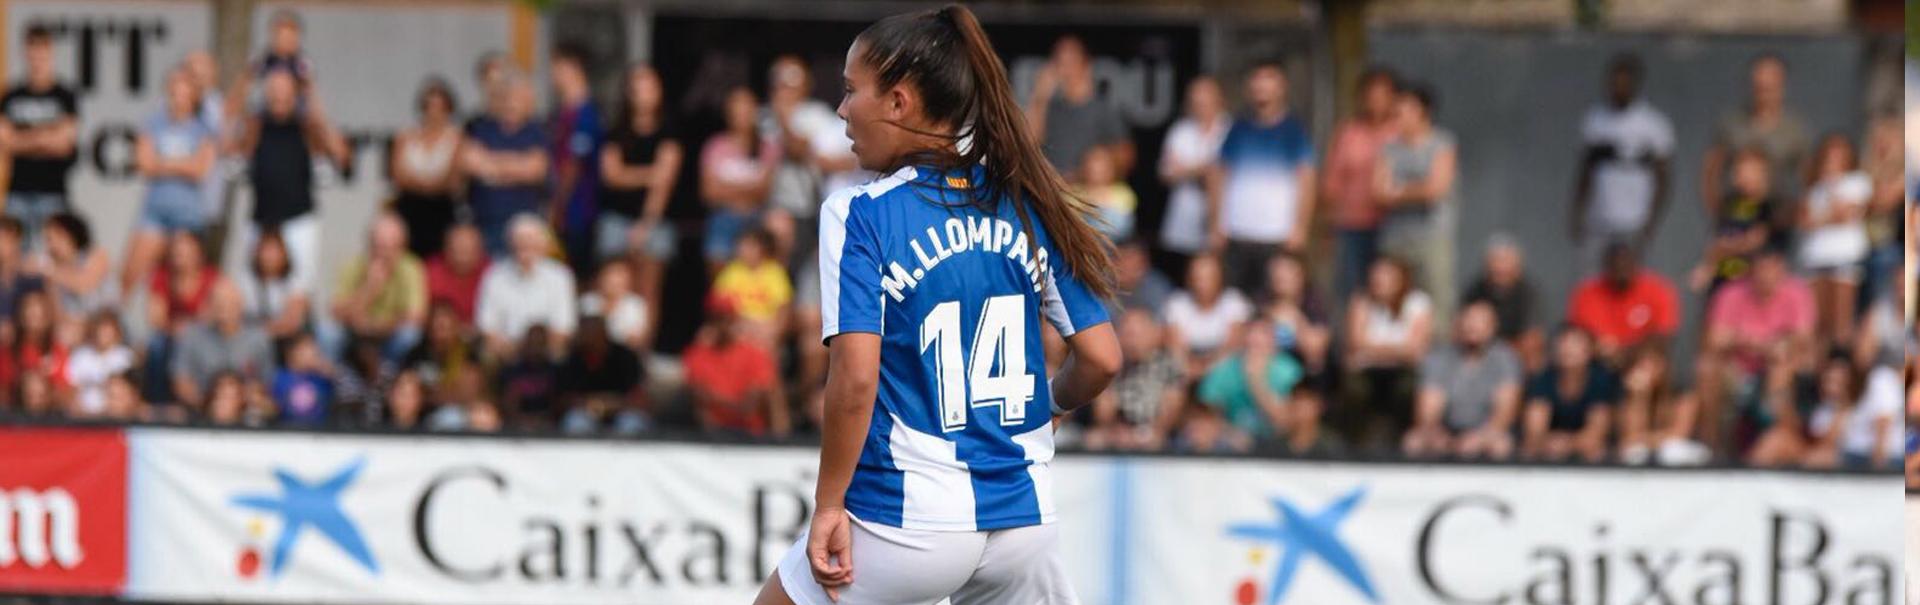 Maria Llompart - Proneo Sports